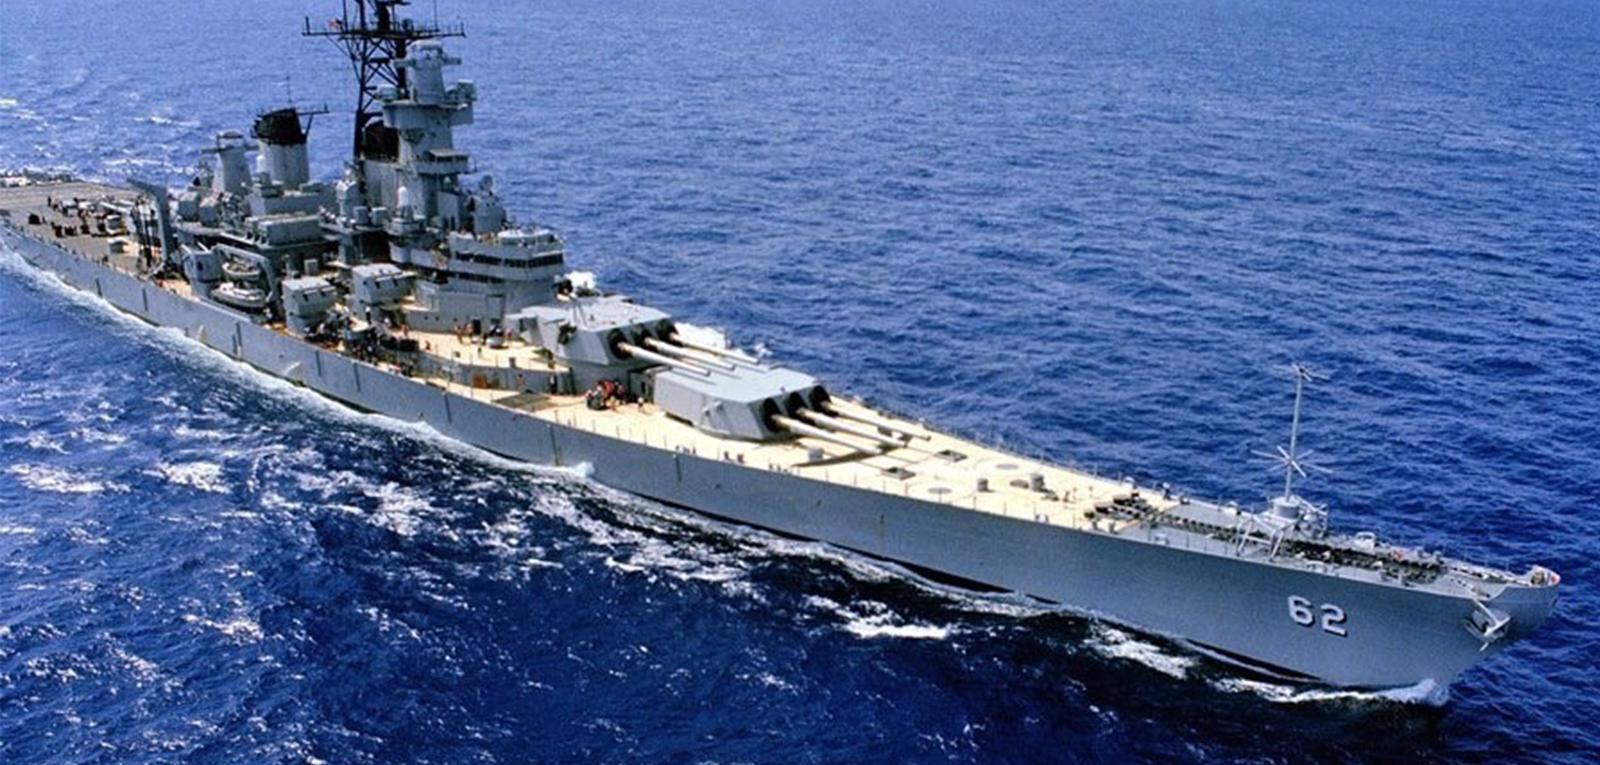 the ship battleship new jersey